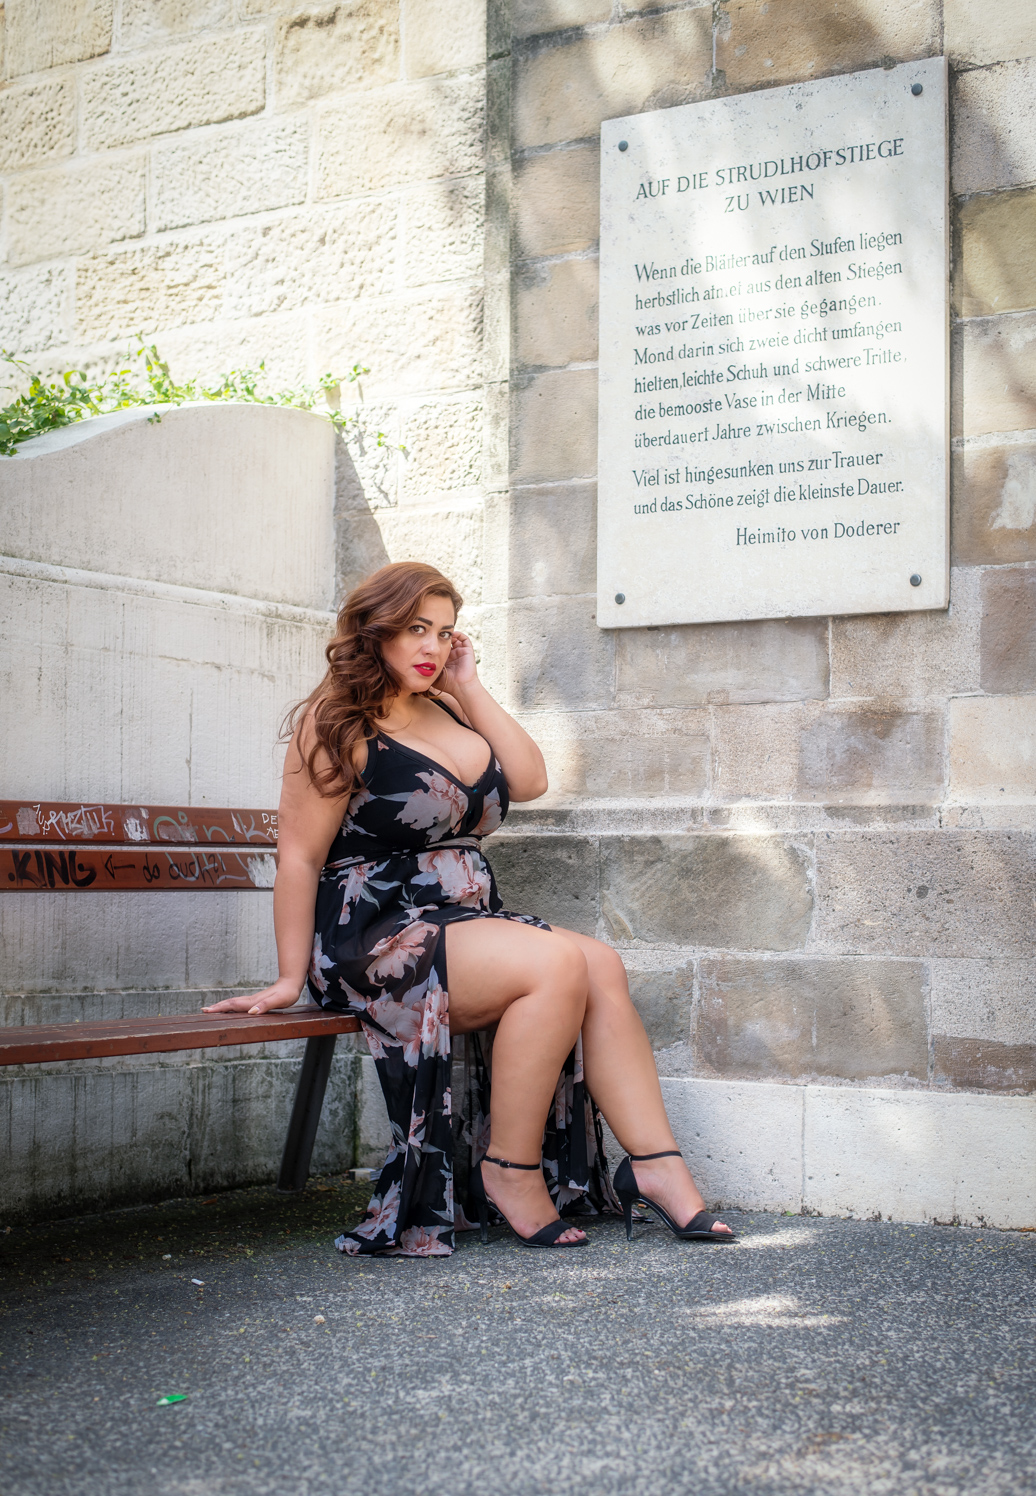 Model: Costina Munteanu  Instagram:  https://www.instagram.com/costina_got_curves/